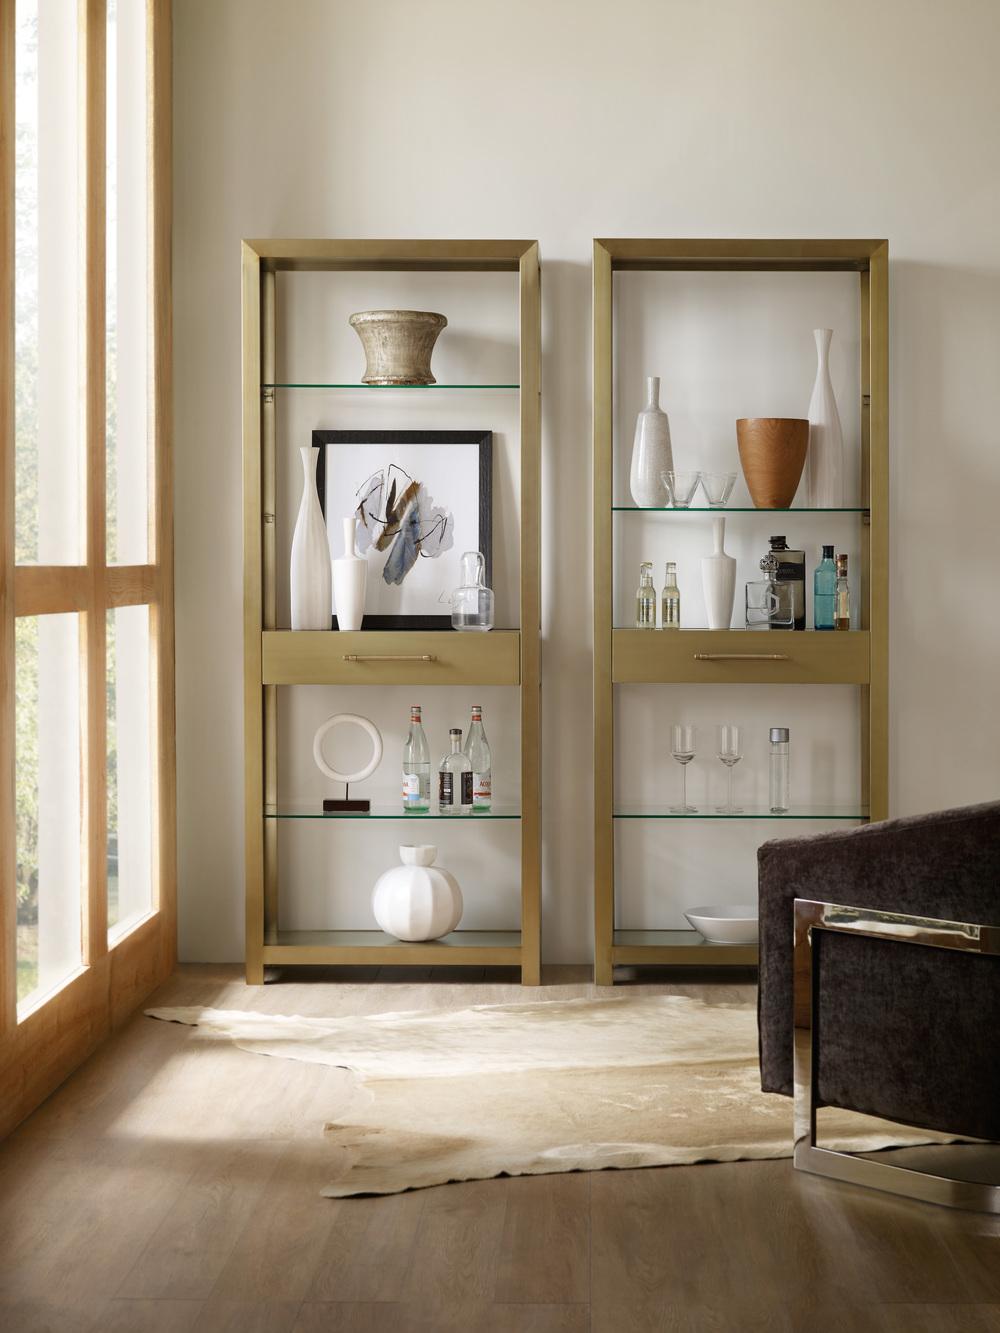 Hooker Furniture - Curata Bunching Bookcase